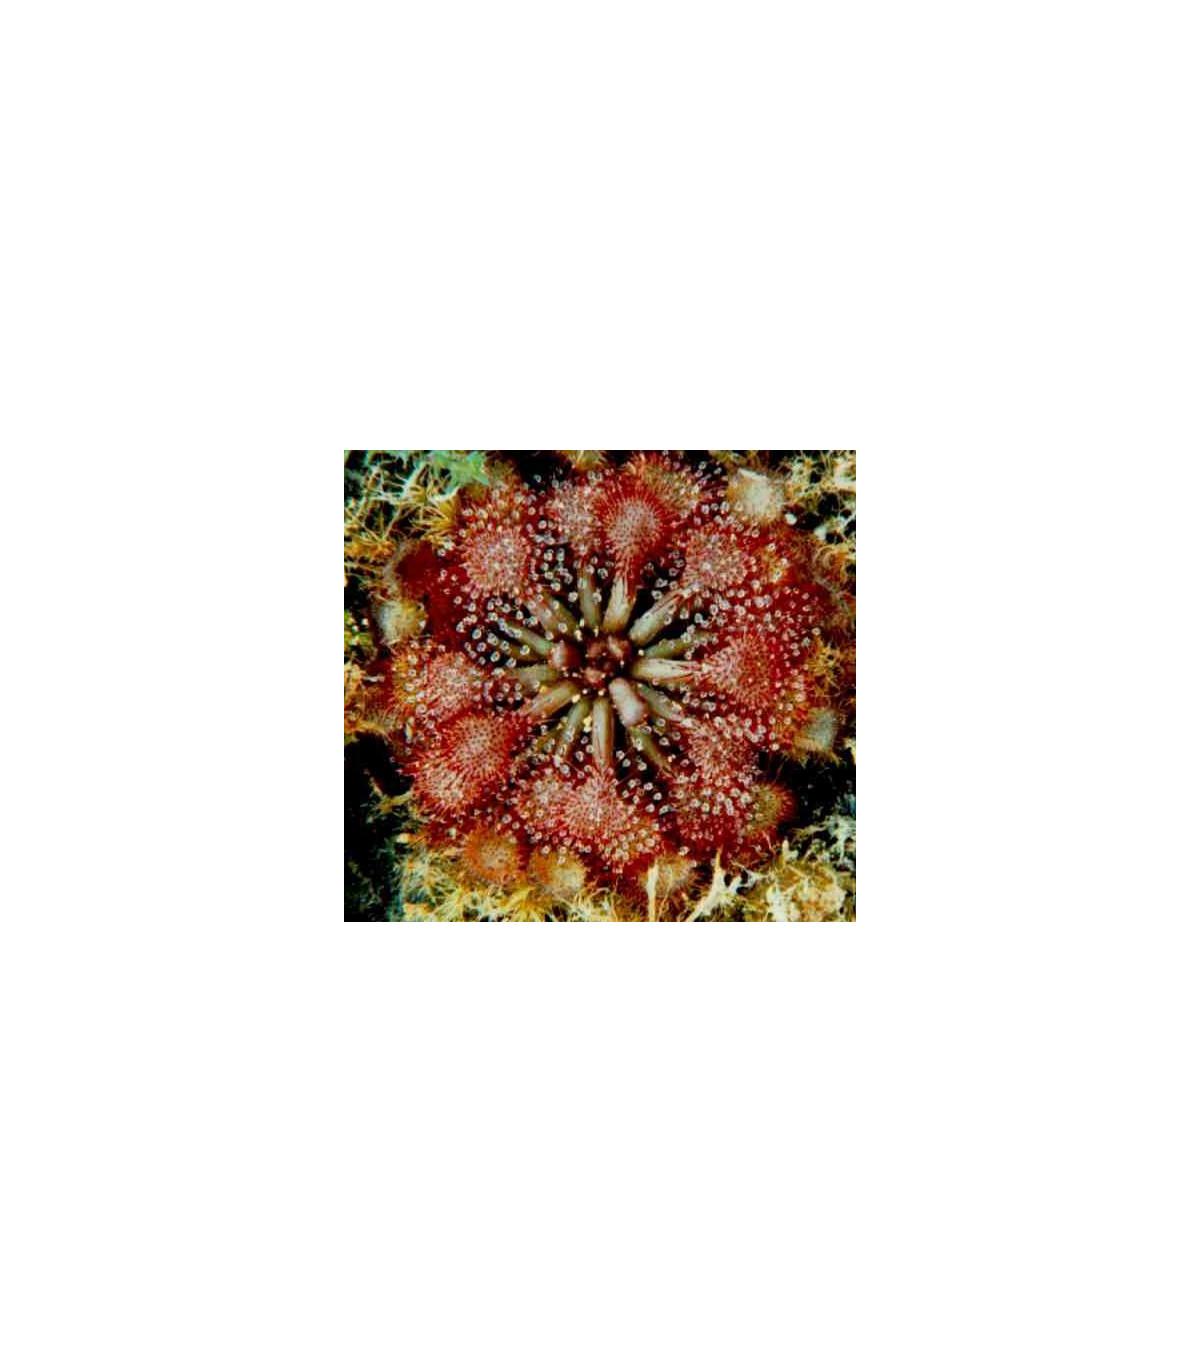 Drosera burkeana - semena rosnatky - 15 ks